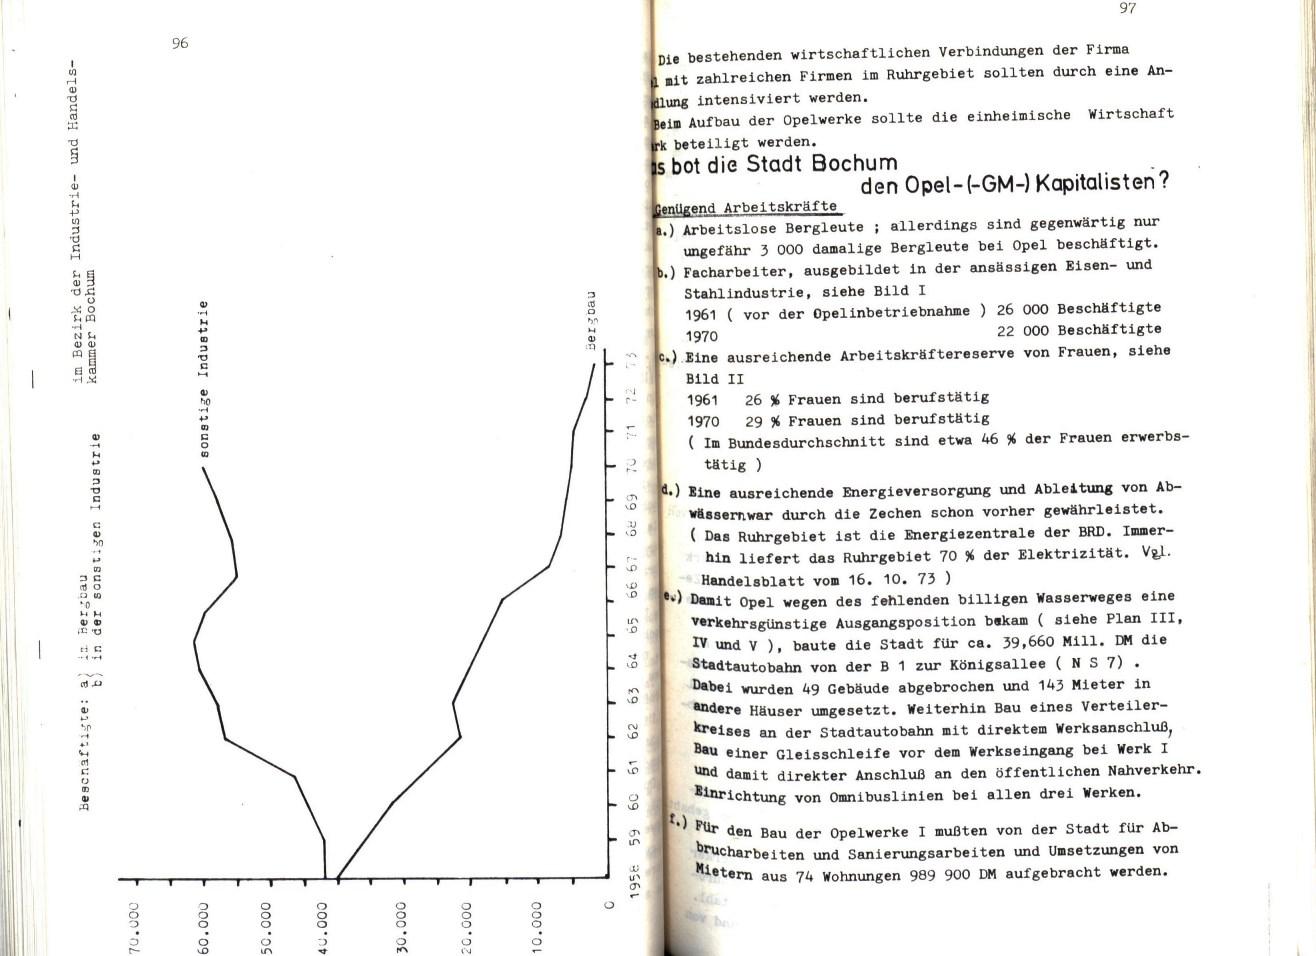 Bochum_IGM_Opel_PG_Opel_streikt_1973_050